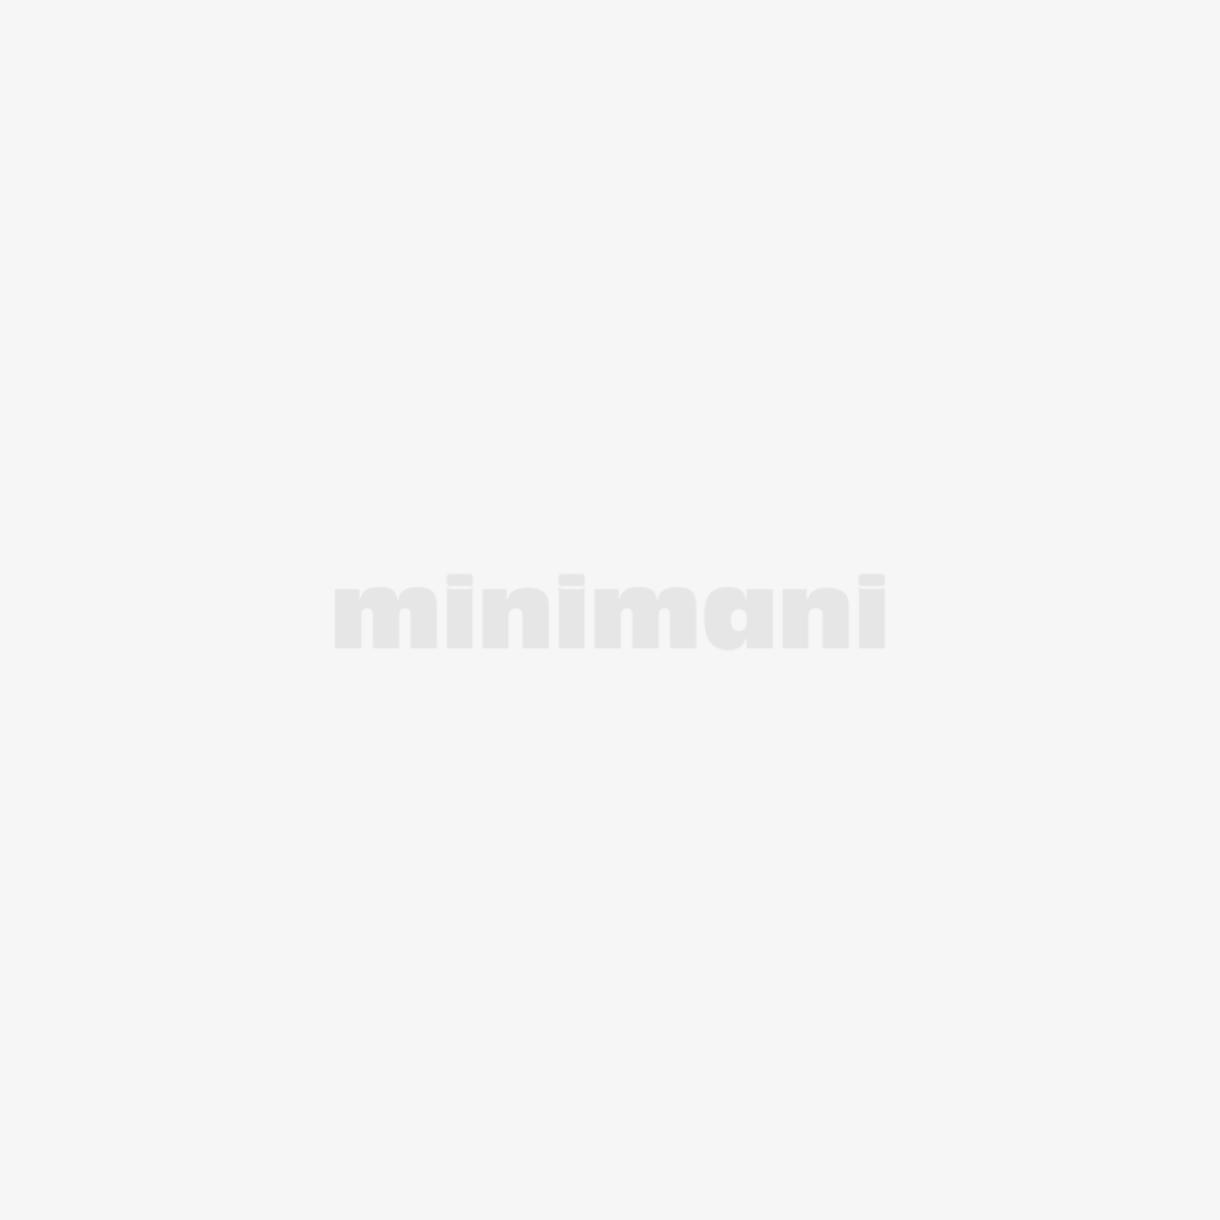 NAILONRIIMU TOPPAUKSIN XFULL MUSTA, HORSE COMFORT